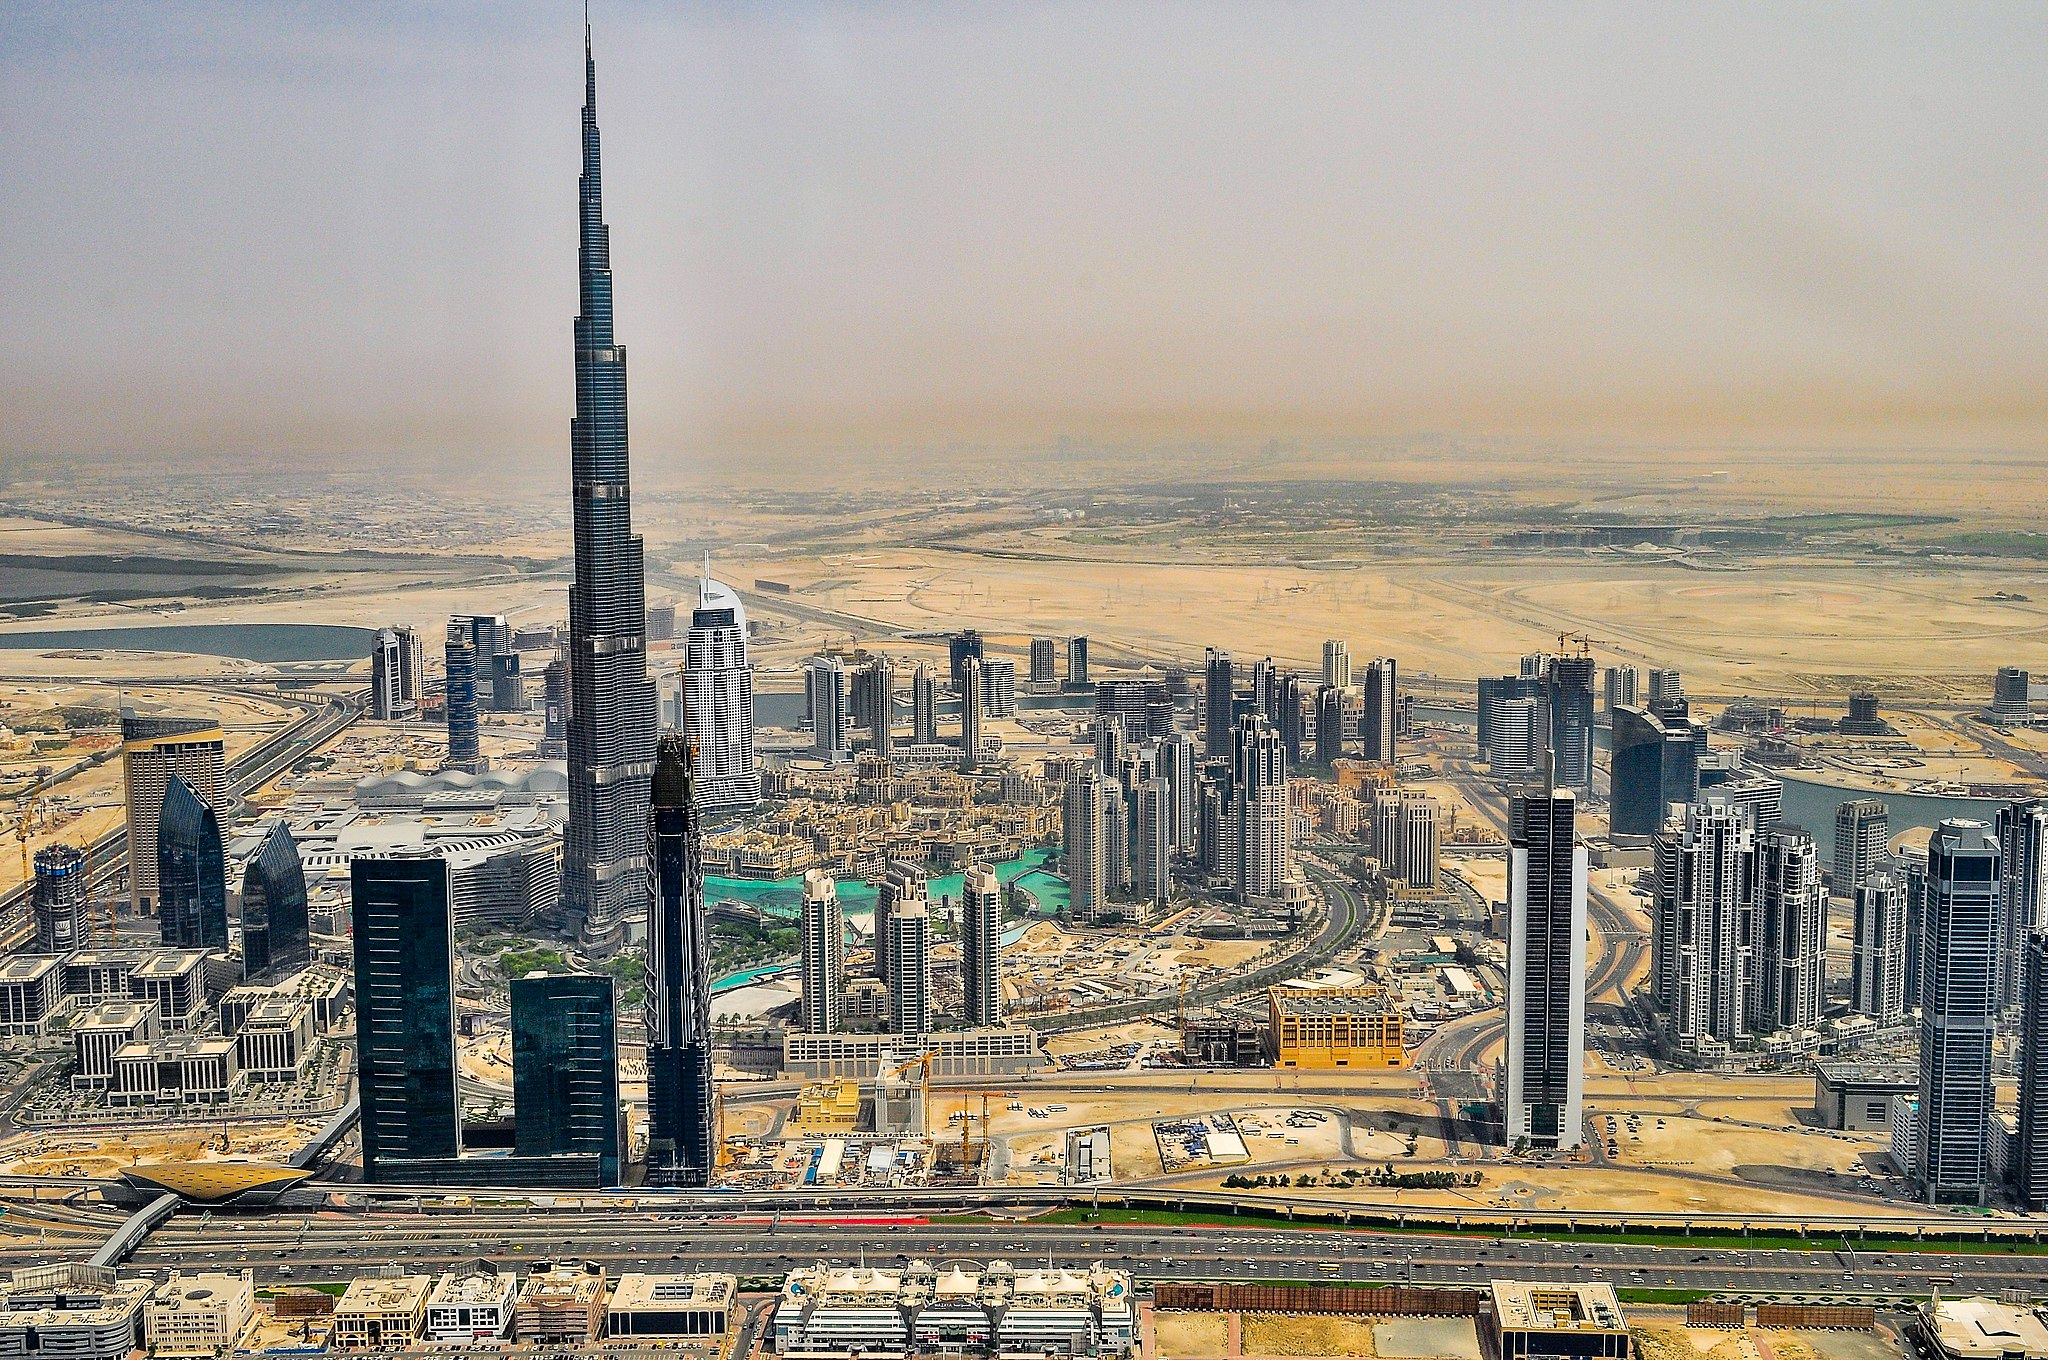 Dubai is Vistara's second international destination after Singapore. Photo courtesy: Wikimedia